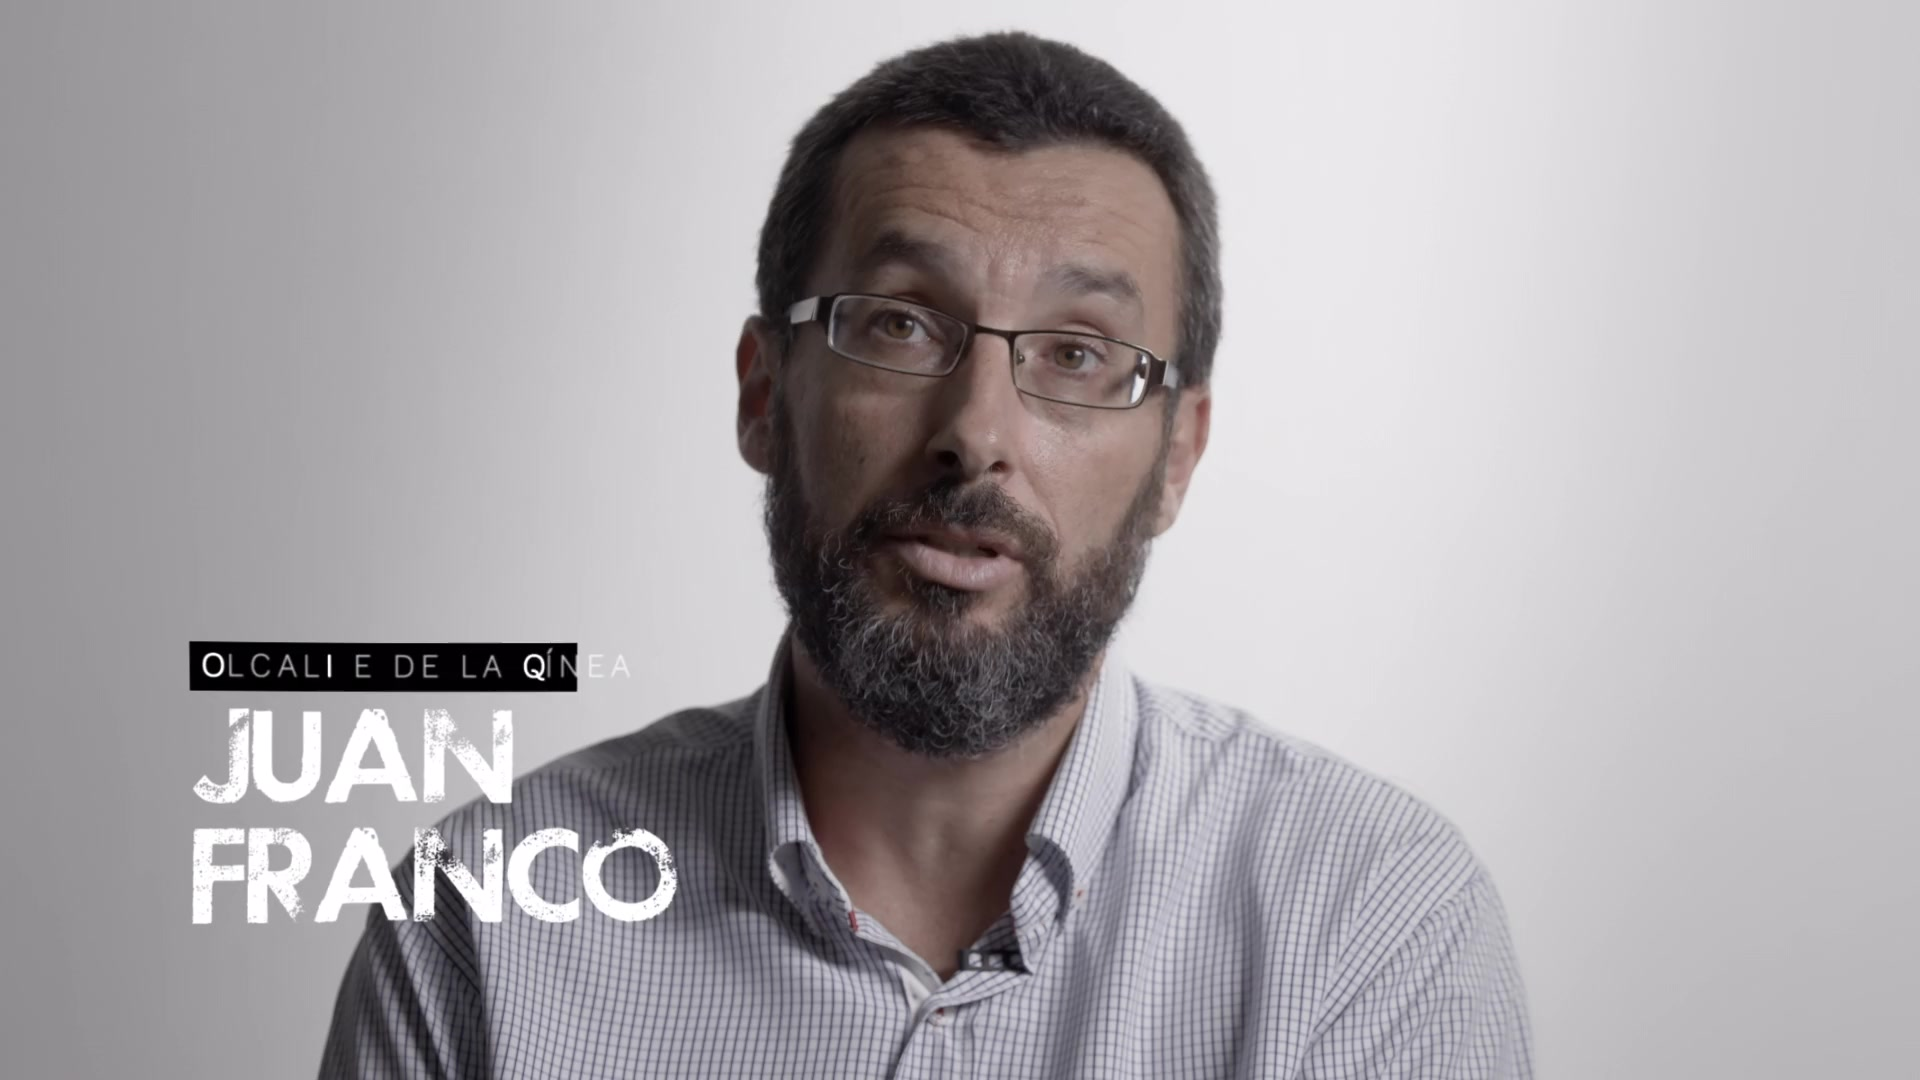 La Línea: Shadow of Narco S01E04